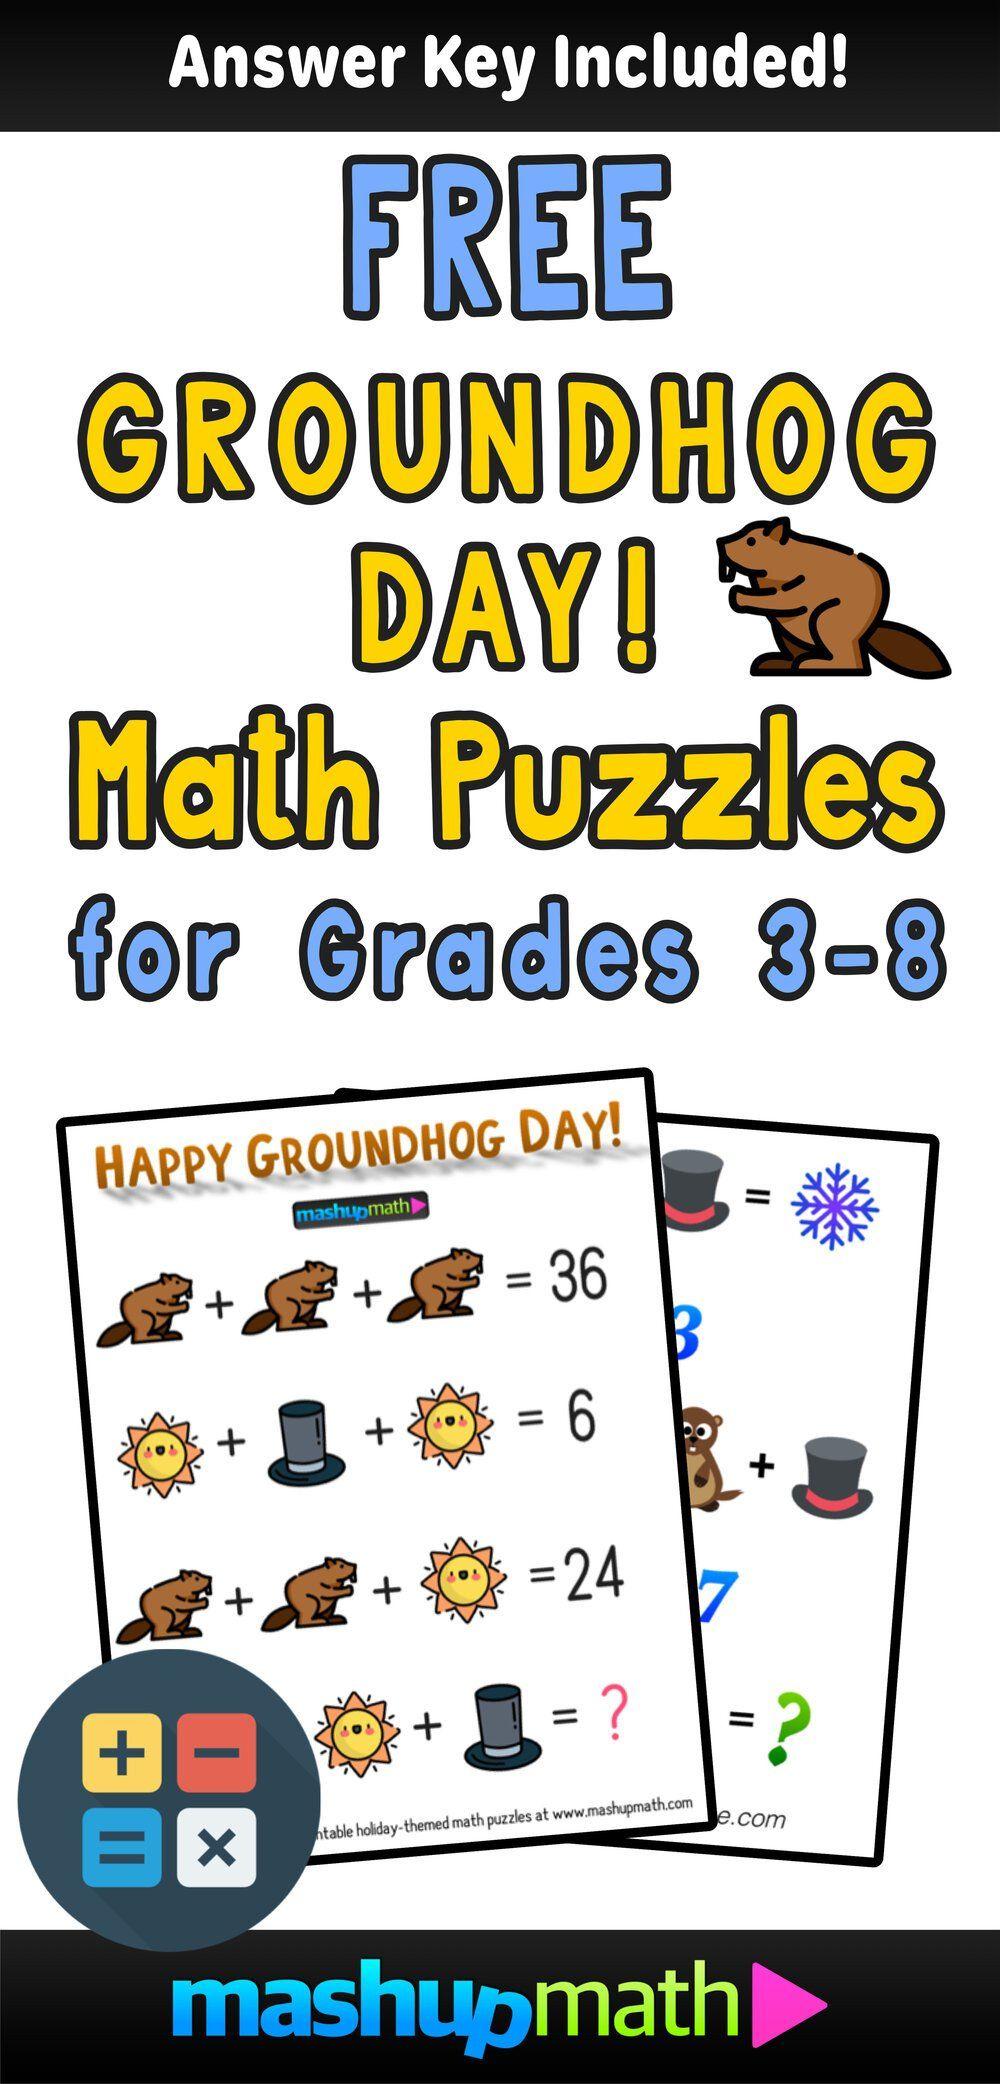 Groundhog Day Math Worksheets Free Inspirational Free Groundhog Day Math Puzzle For Grades 3 8 Mashup M Maths Puzzles Math Worksheets Math Graphic Organizers [ 2084 x 1000 Pixel ]